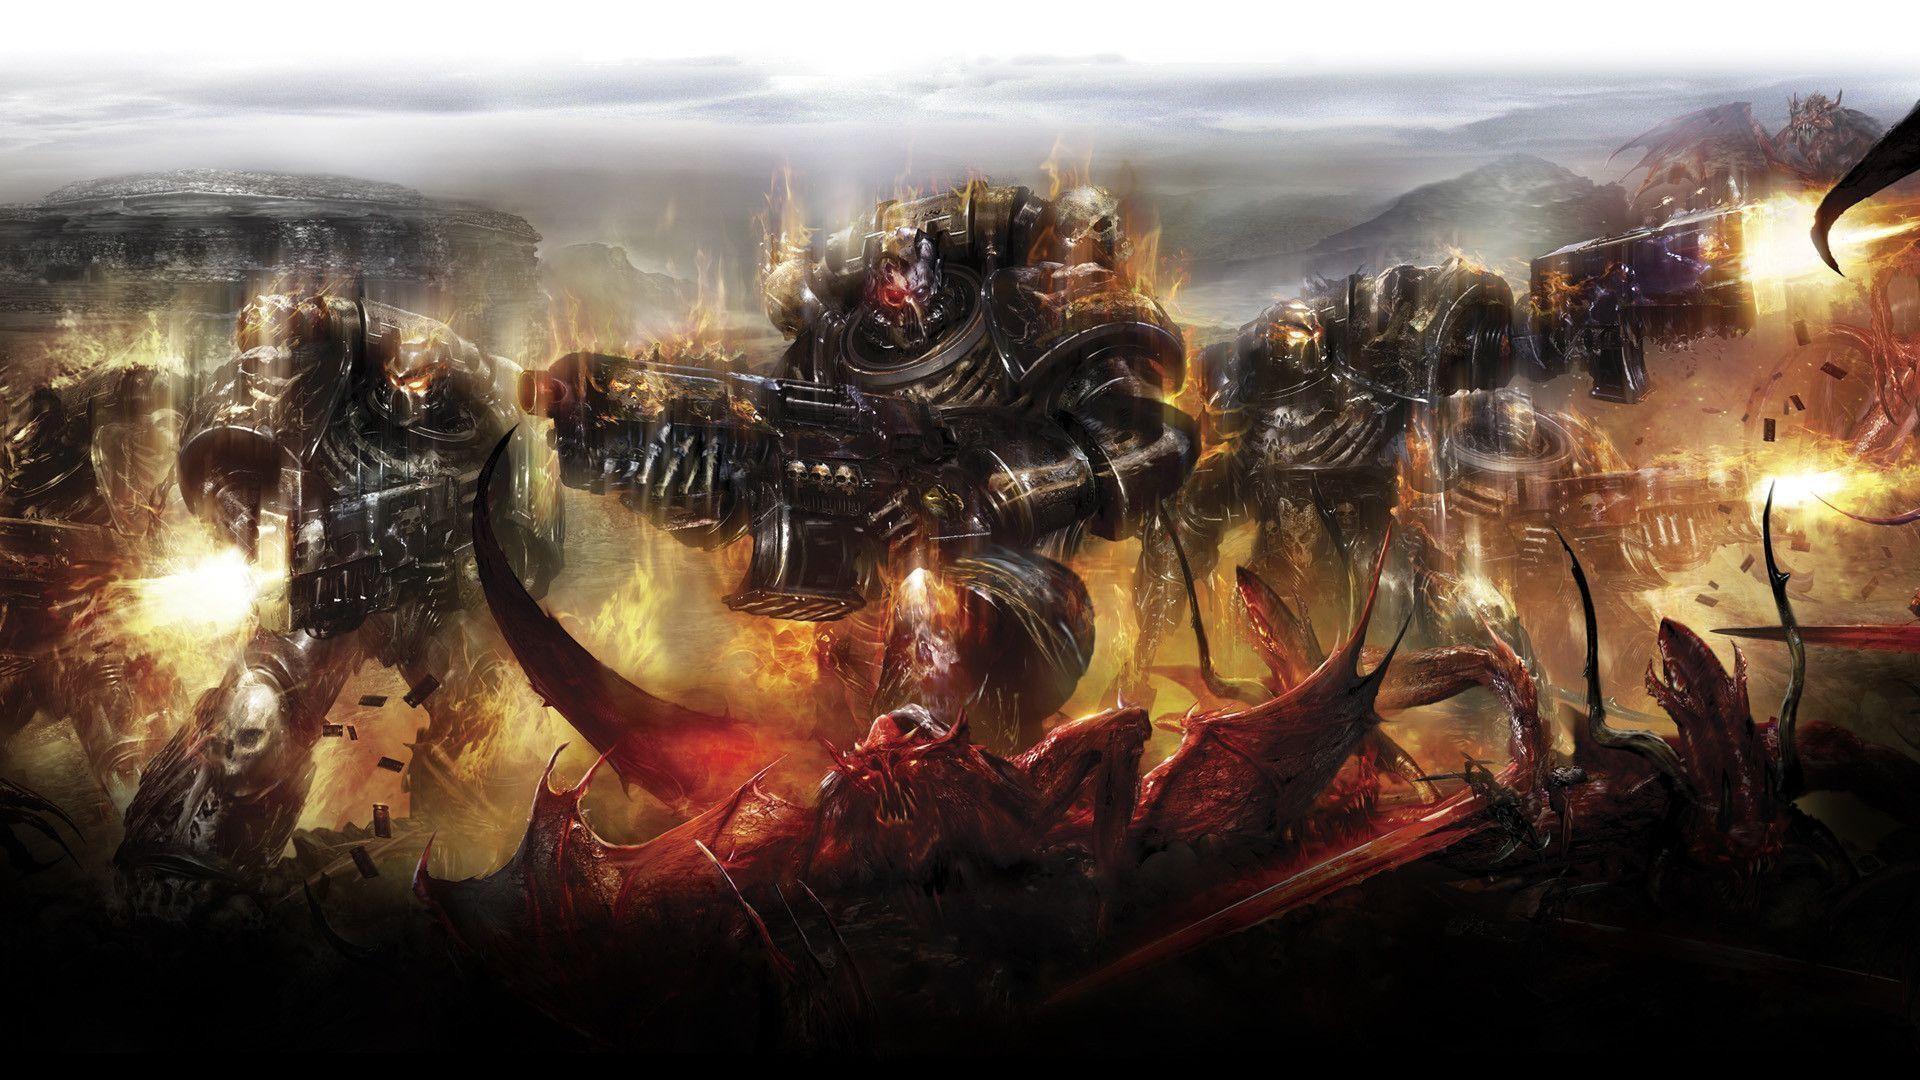 Warhammer 40K Dark Eldar Wallpaper HD – dlwallhd.